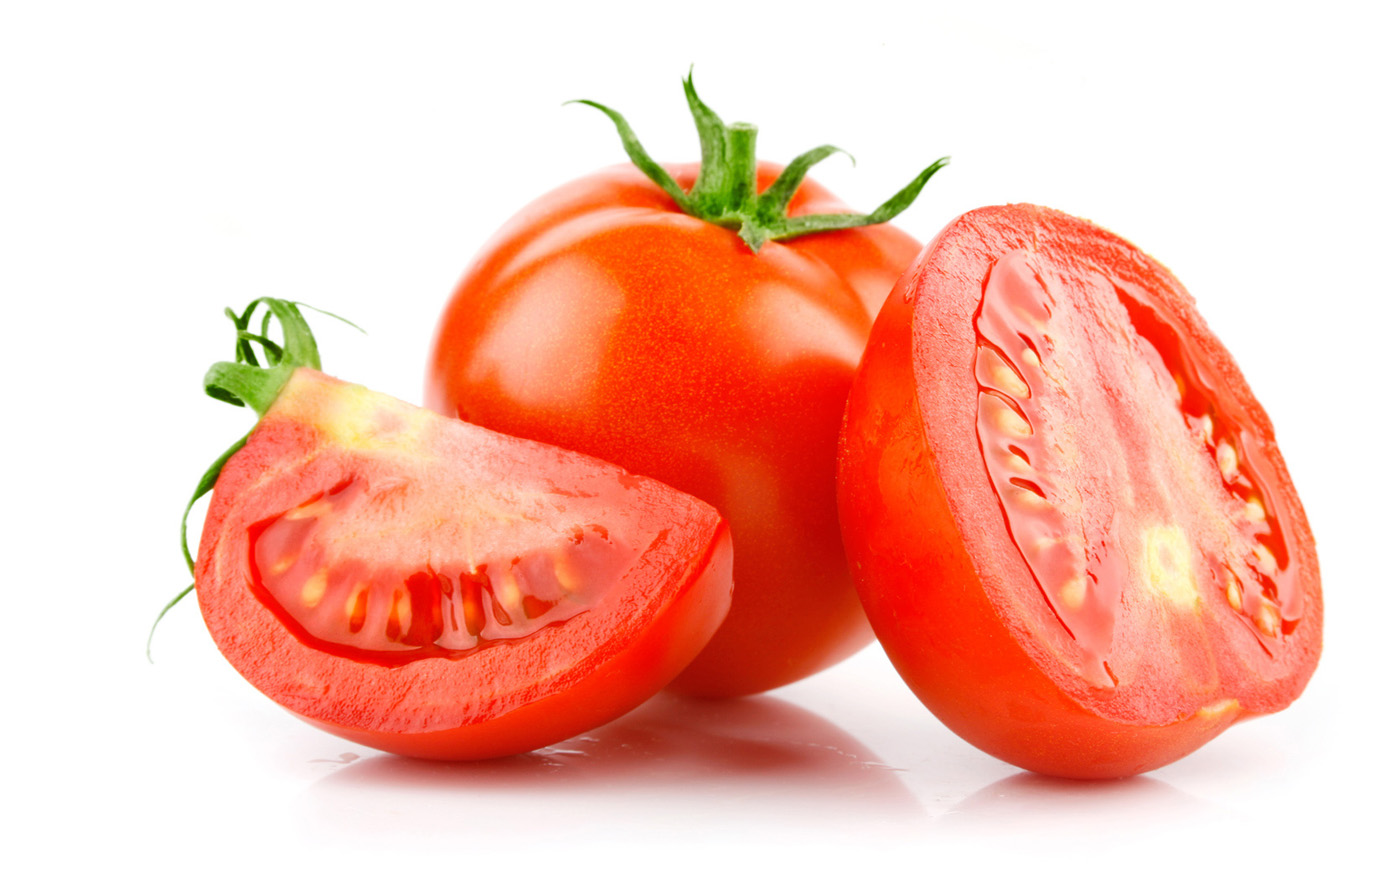 Tomato pictures